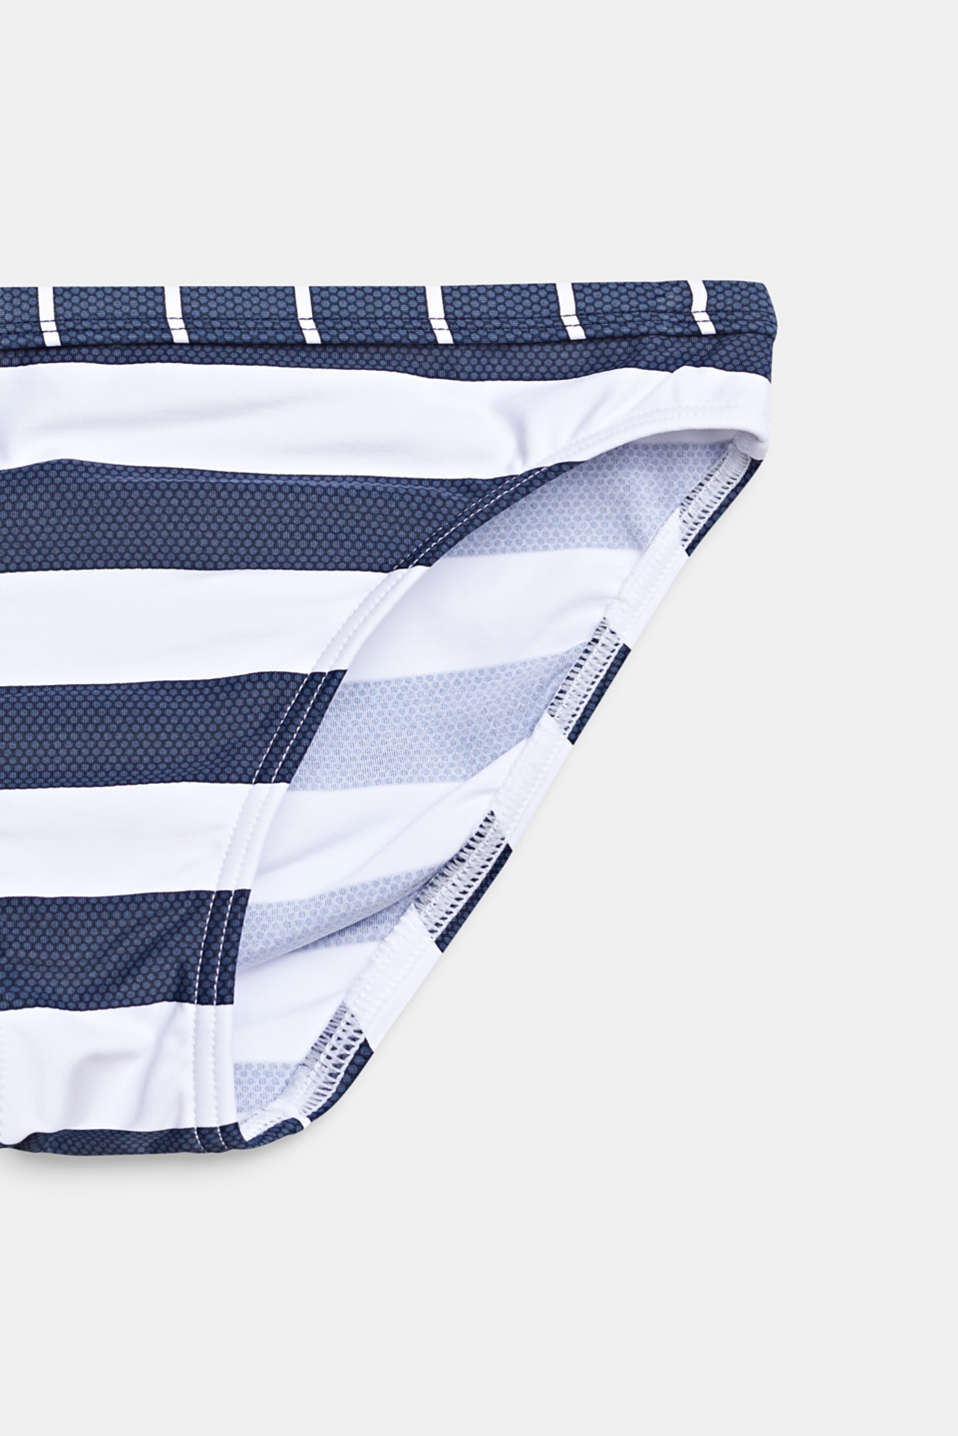 Crop top bikini set with stripes, DARK BLUE, detail image number 2